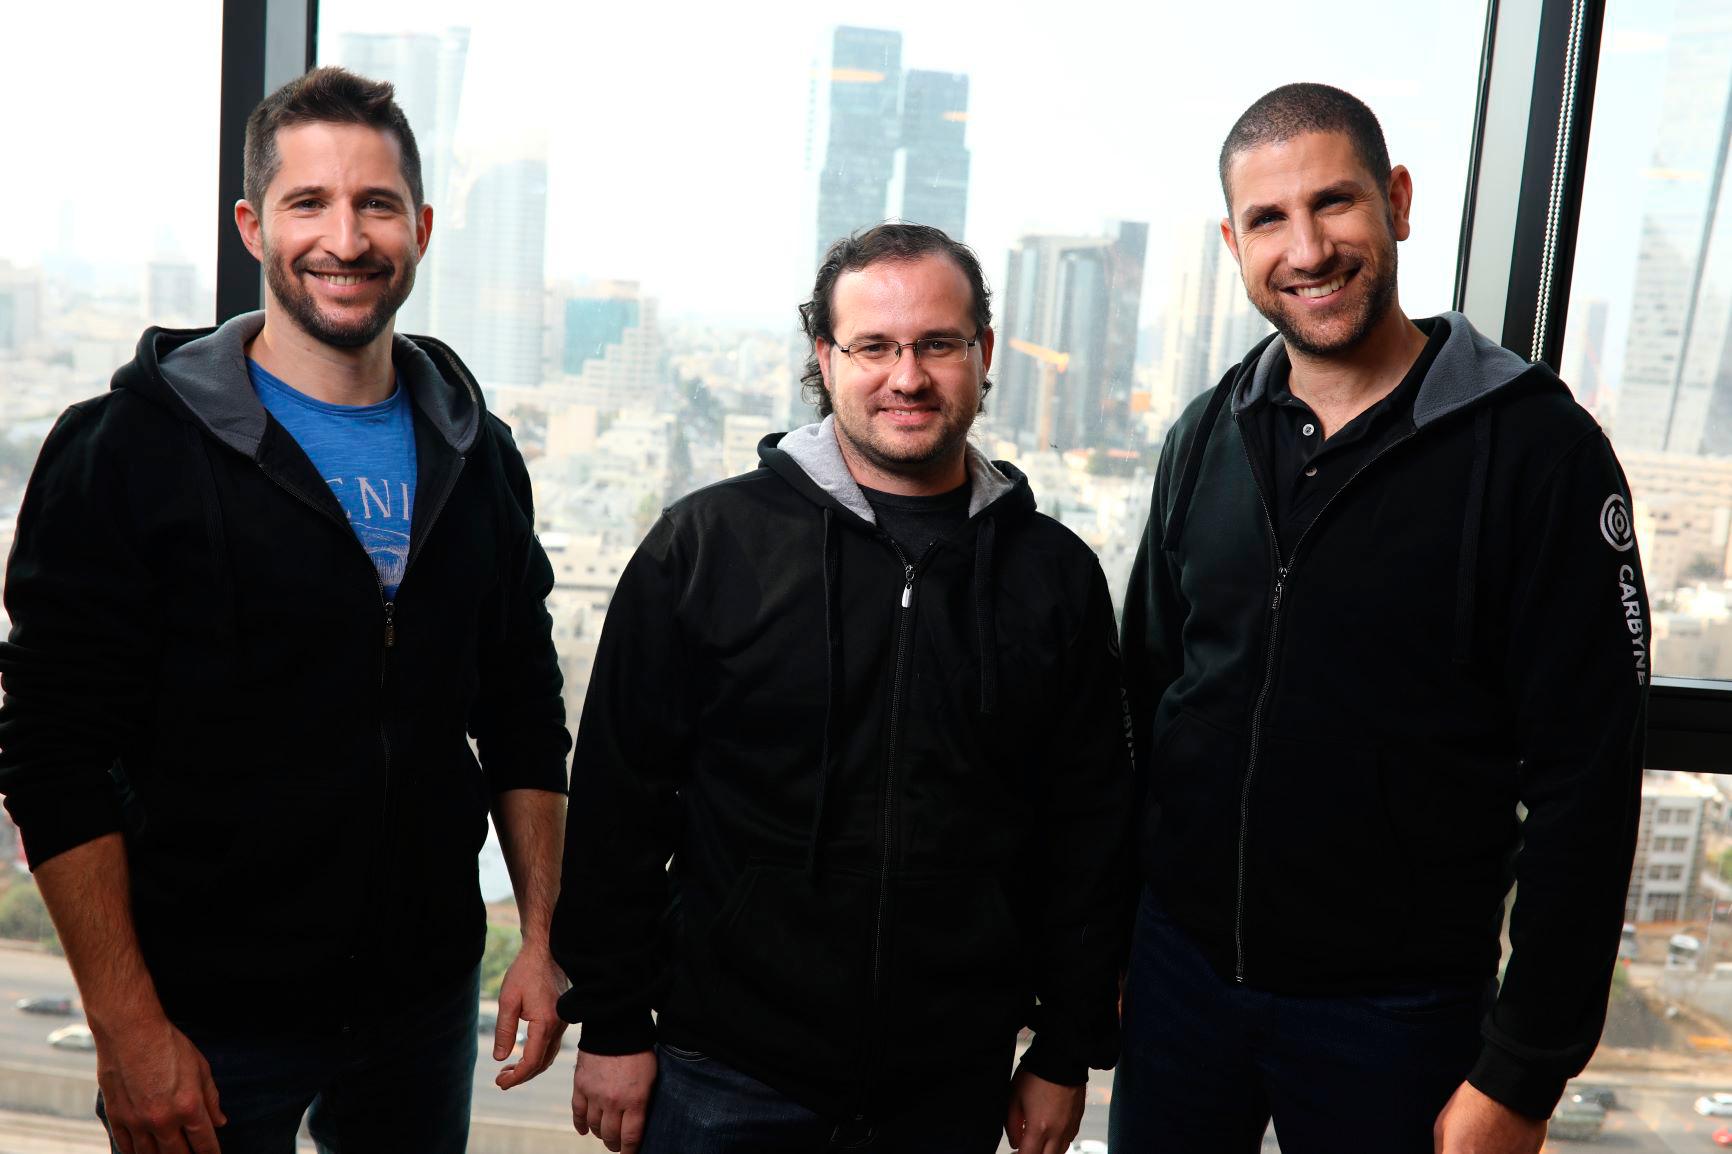 Carybne co-founders Amir Elichai (from right), Yony Yatsun and Alex Dizengoff. Photo: Avishai Finkelstein